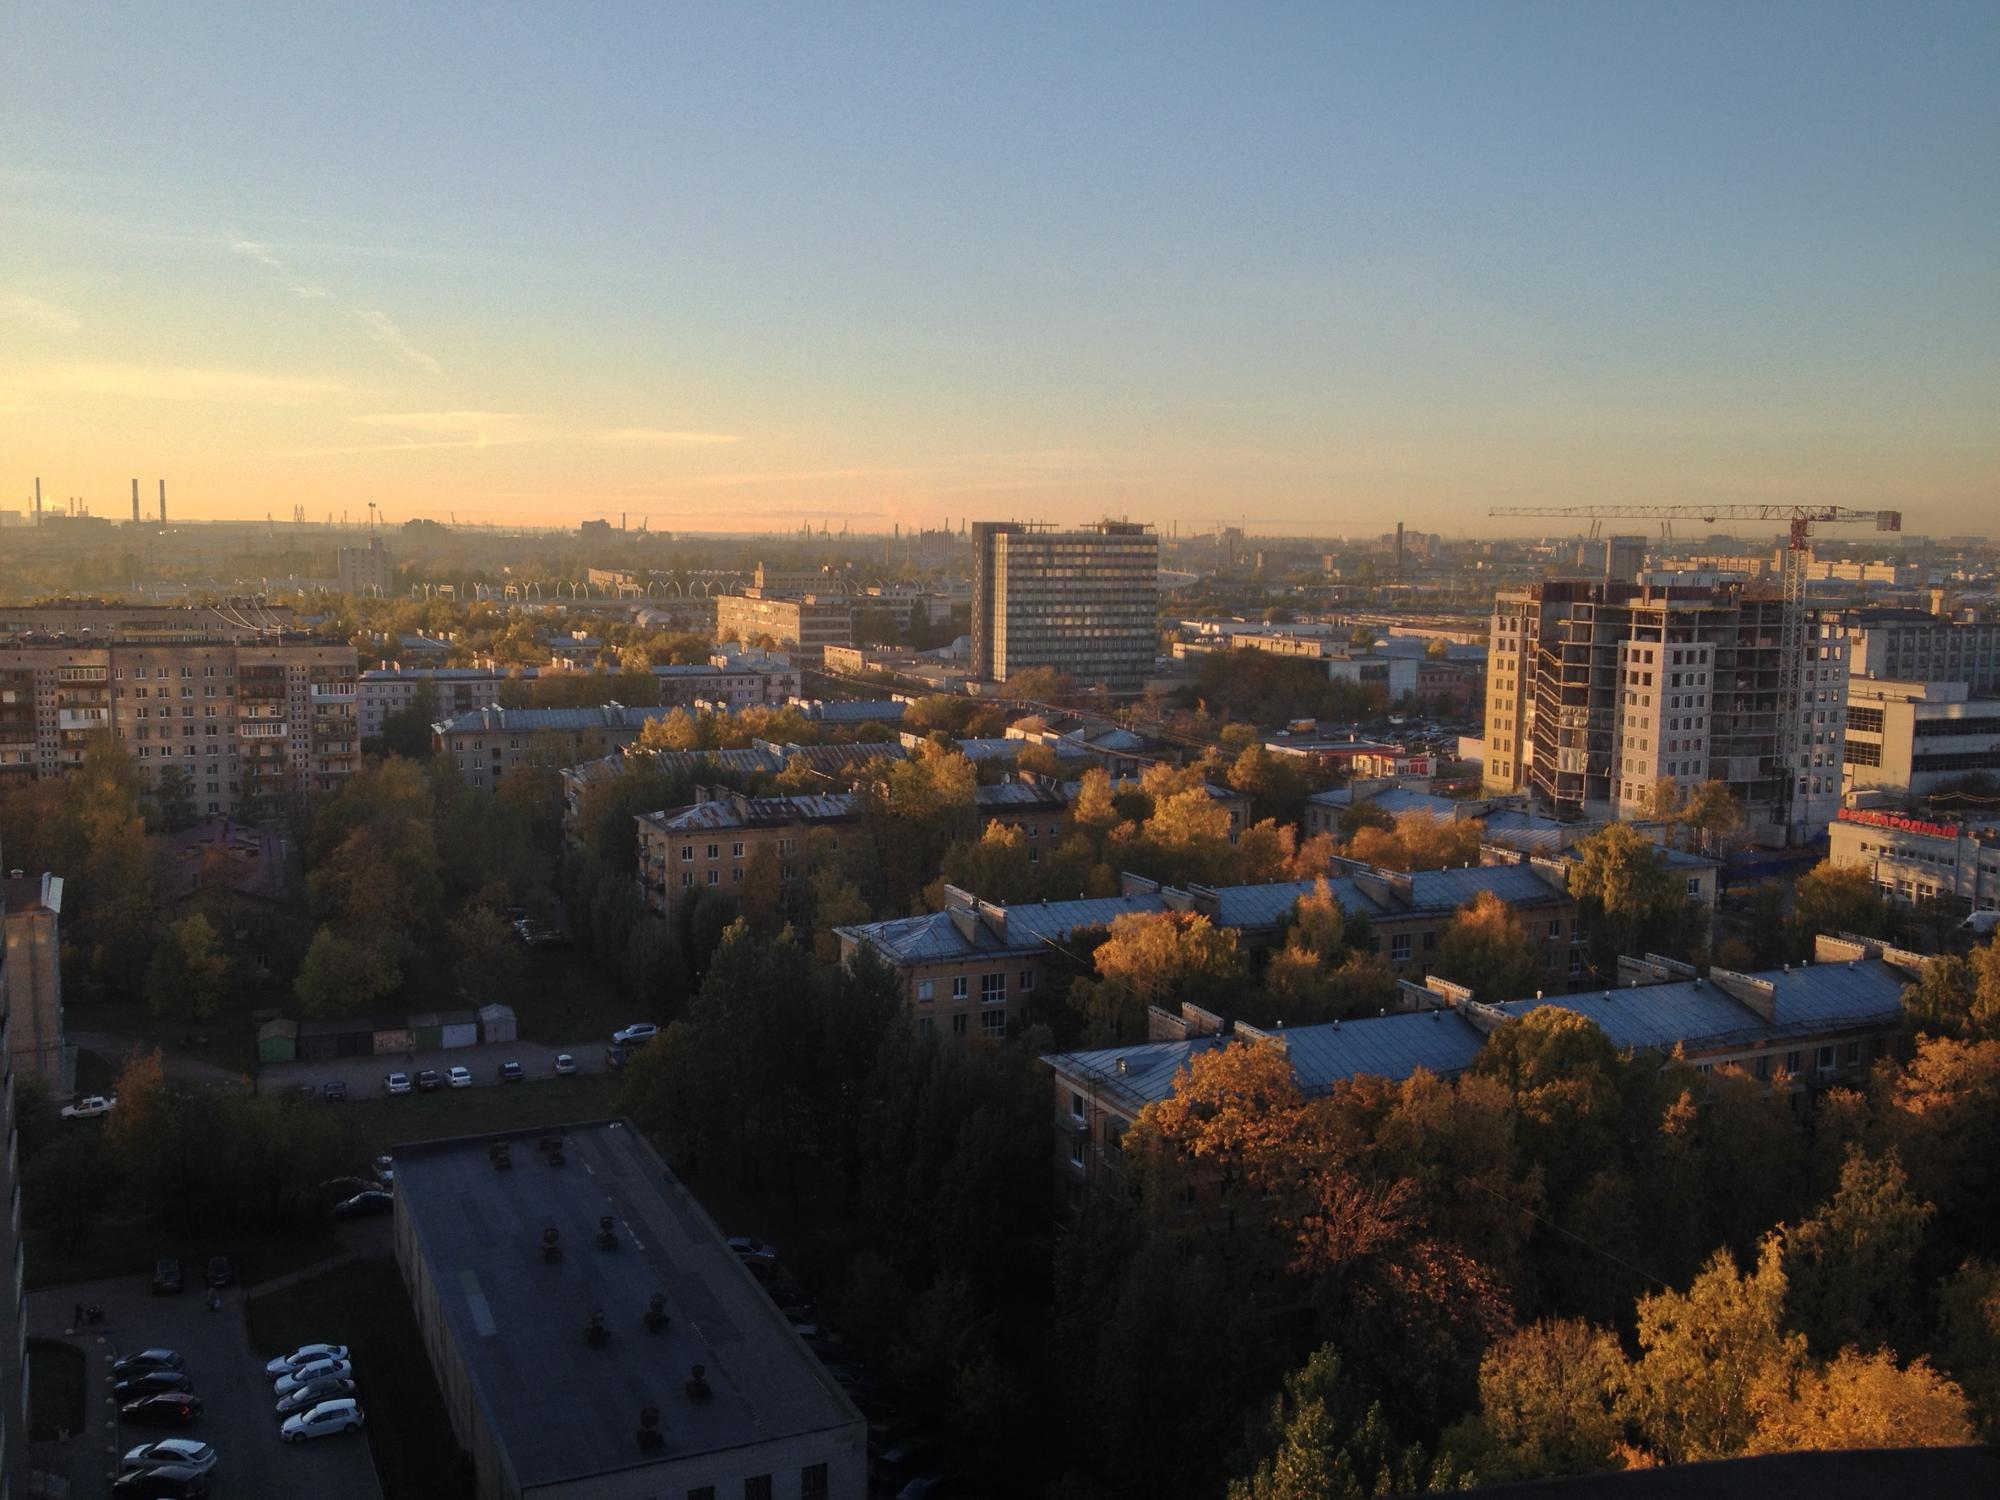 🇷🇺 Санкт-Петербург, Россия, октябрь 2015.